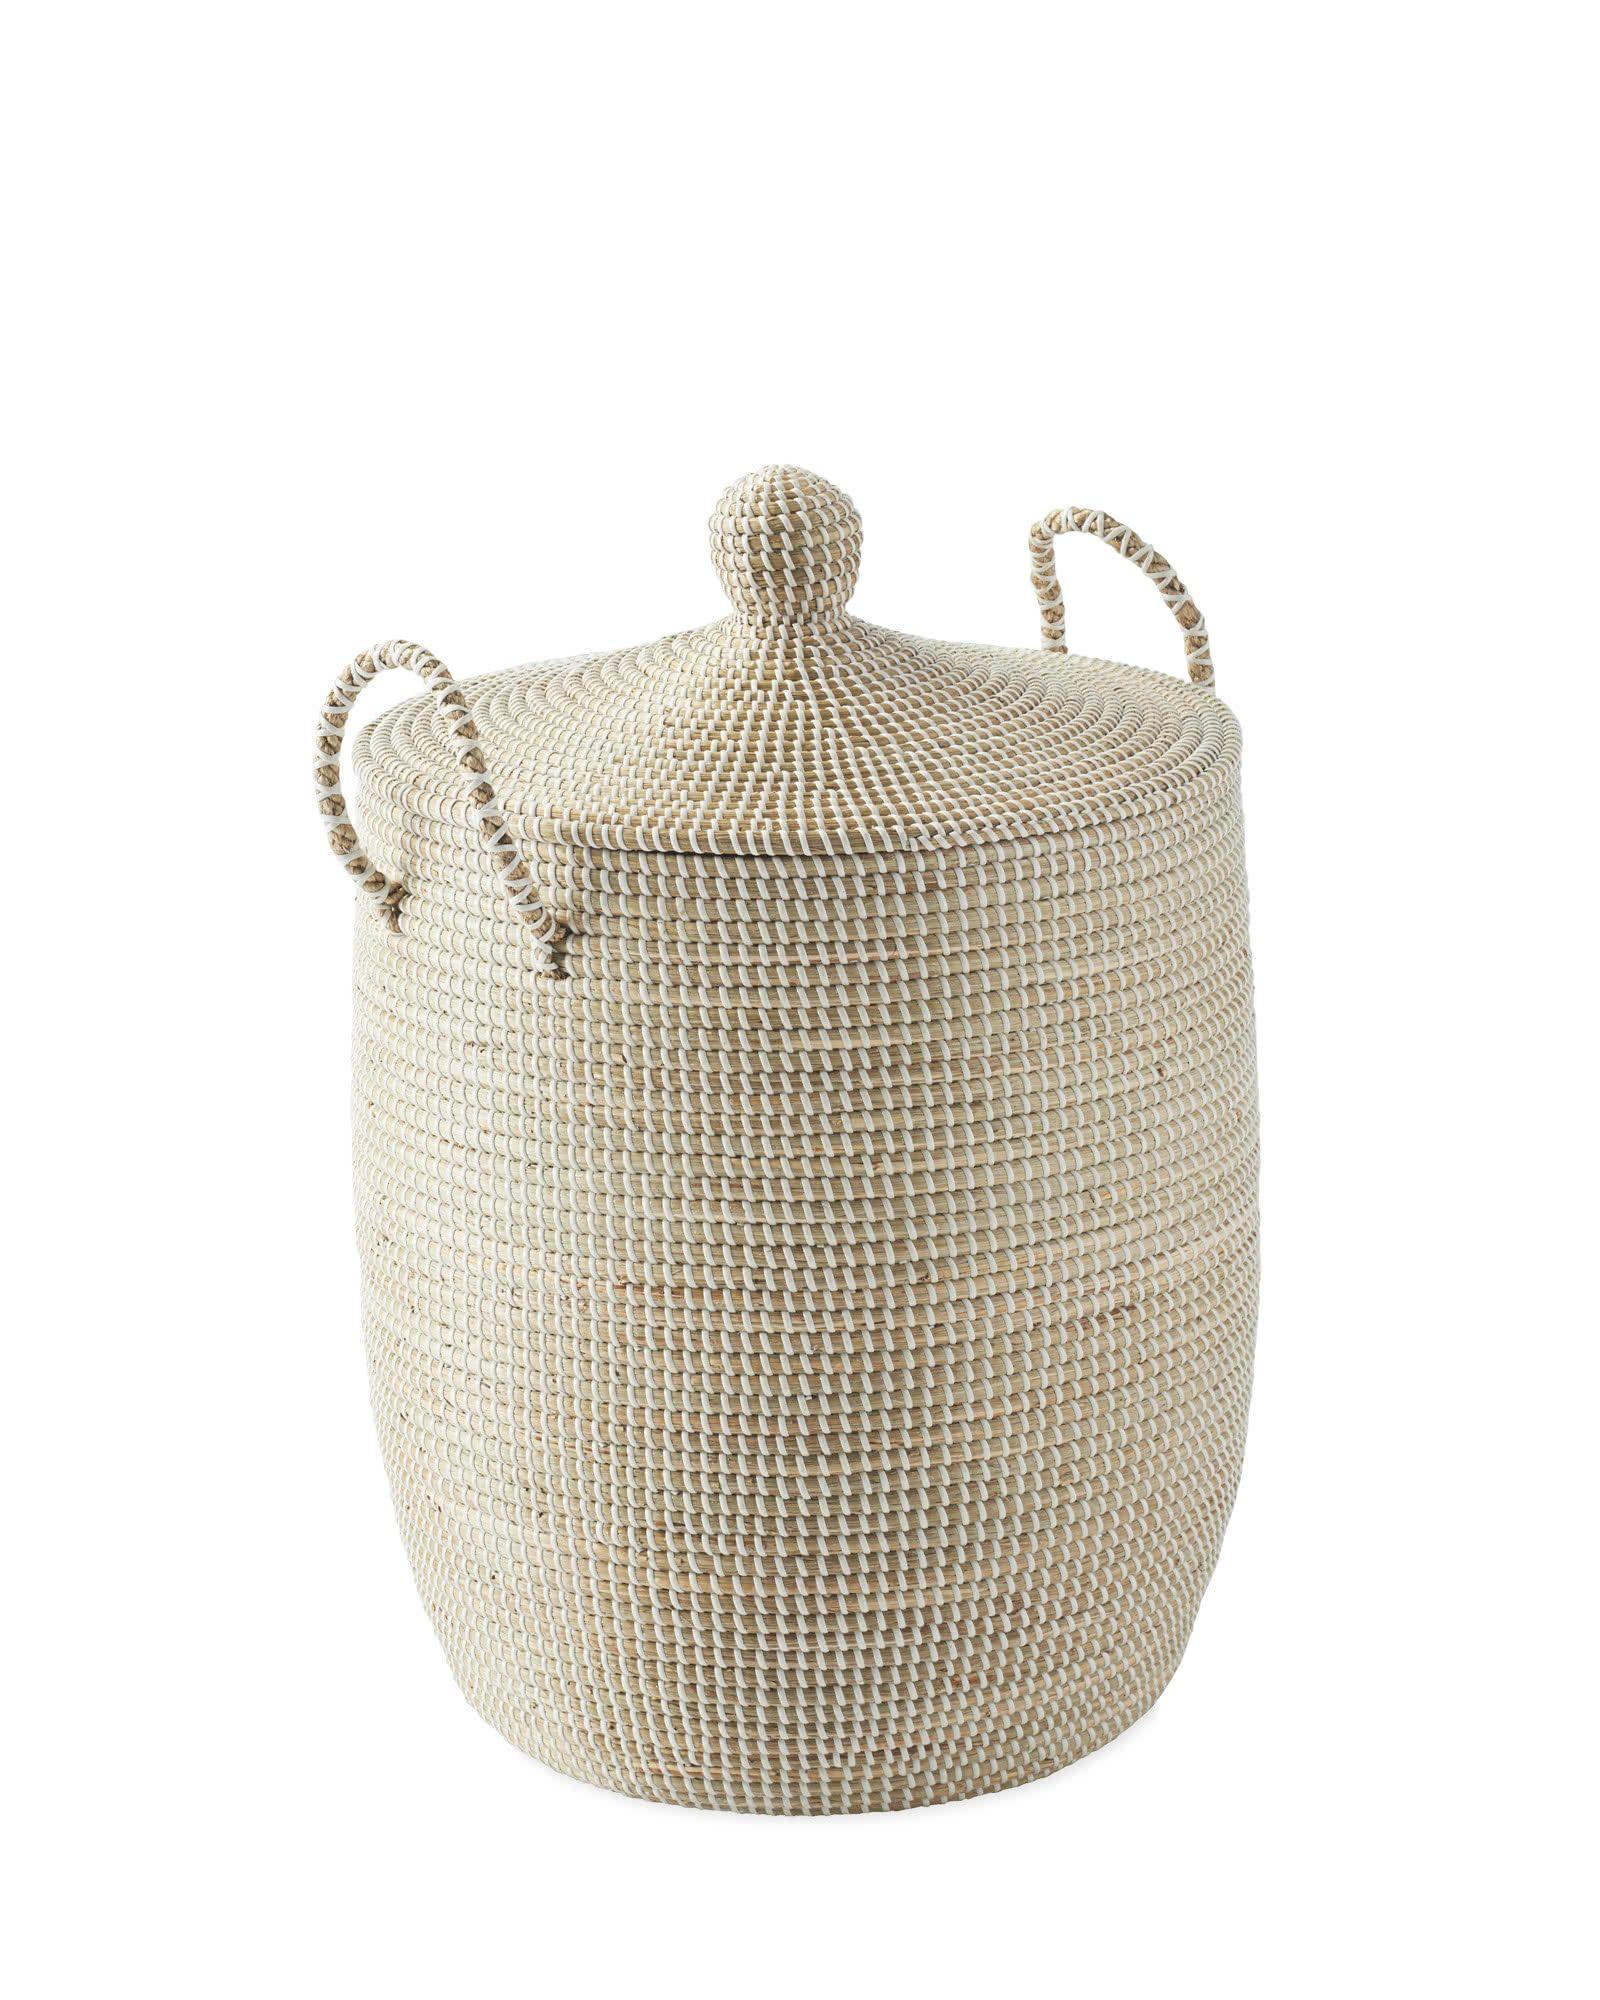 Solid La Jolla Baskets White Serena Amp Lily In 2020